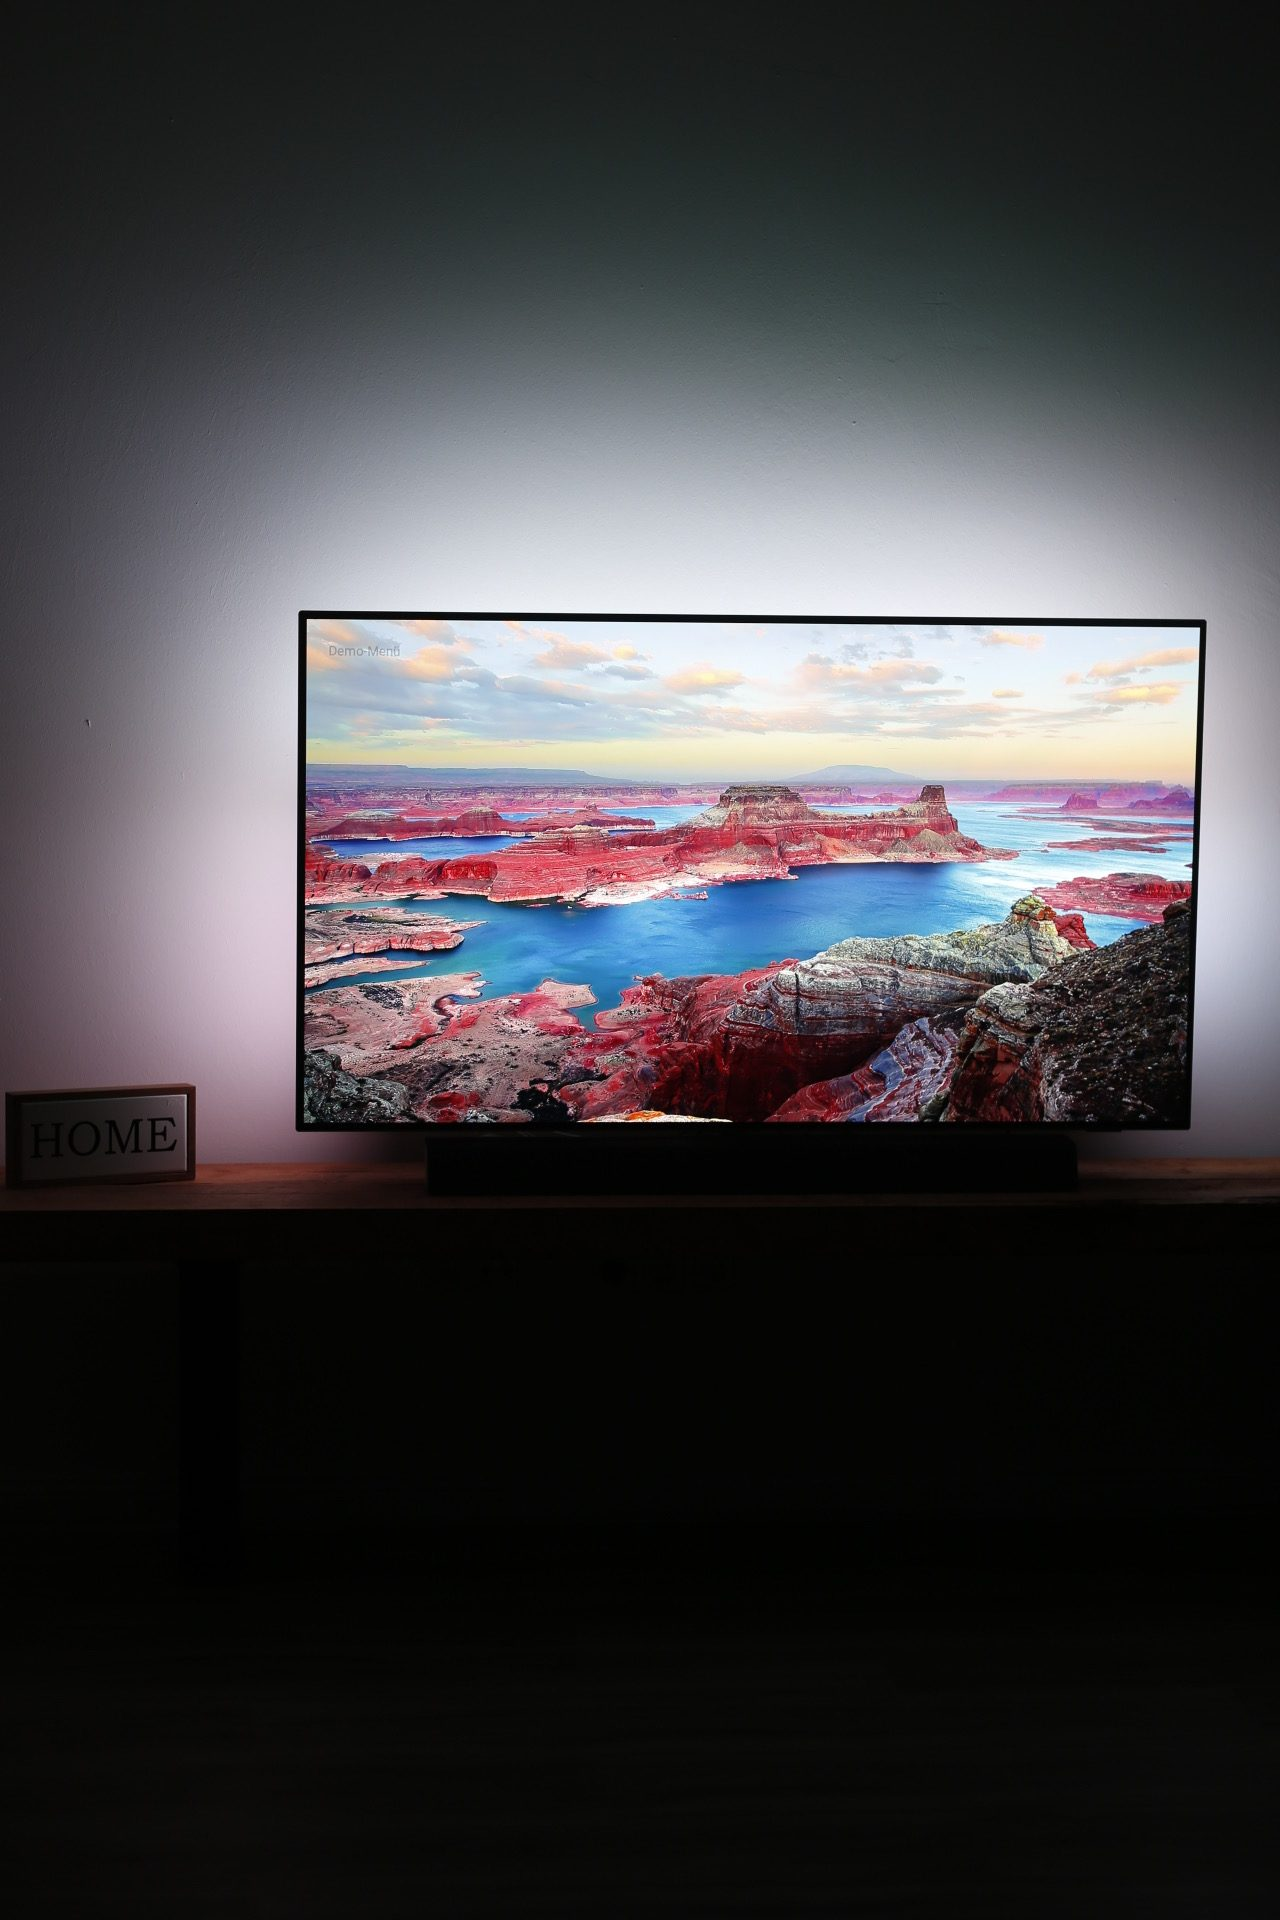 Philips TV OLED+ 934 Ambilight // Kinoerlebnis in den eigenen Wänden